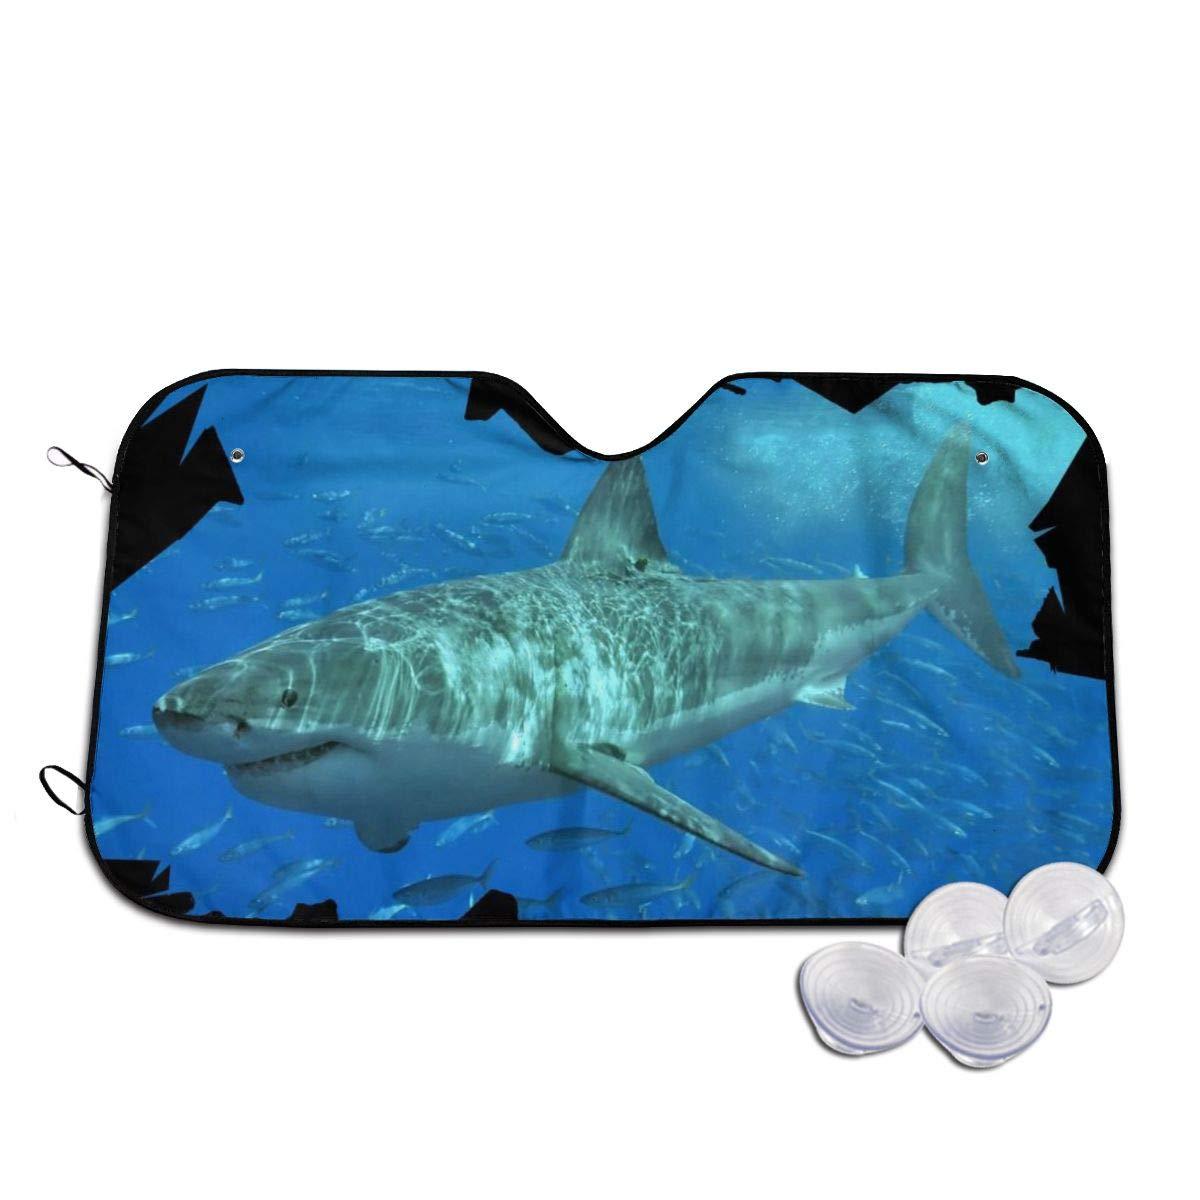 Shark Windshields Sun Shade 3D Printed Long Lasting